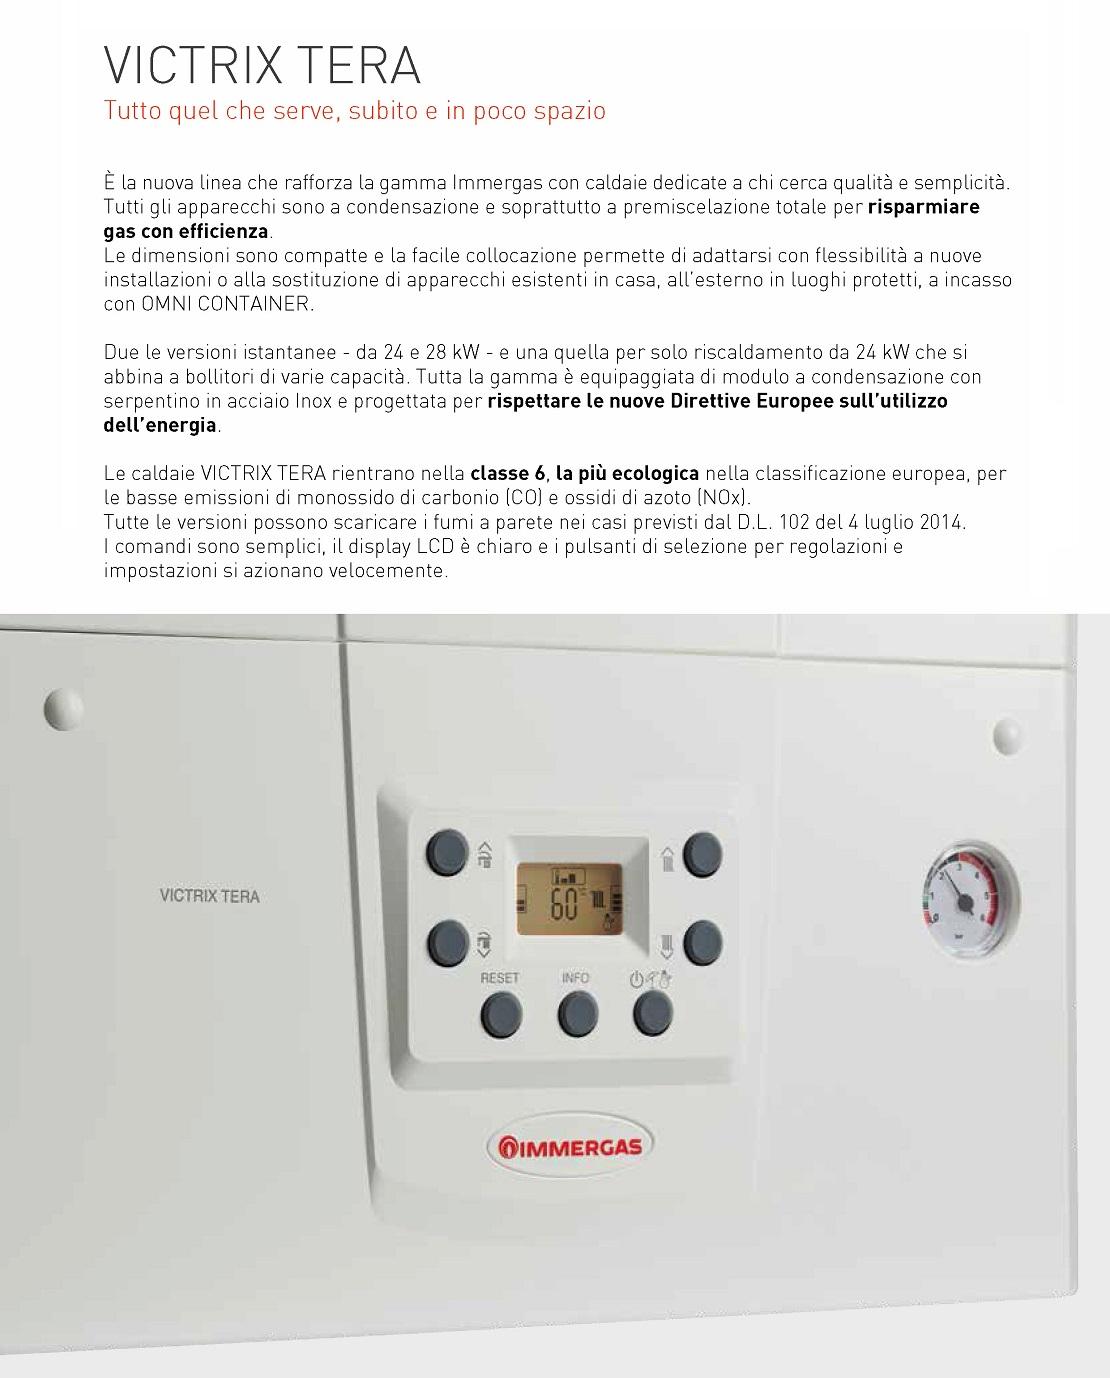 Immergas Caldaia a condensazione Victrix TERA 24 24 kW A/A-XL Metano